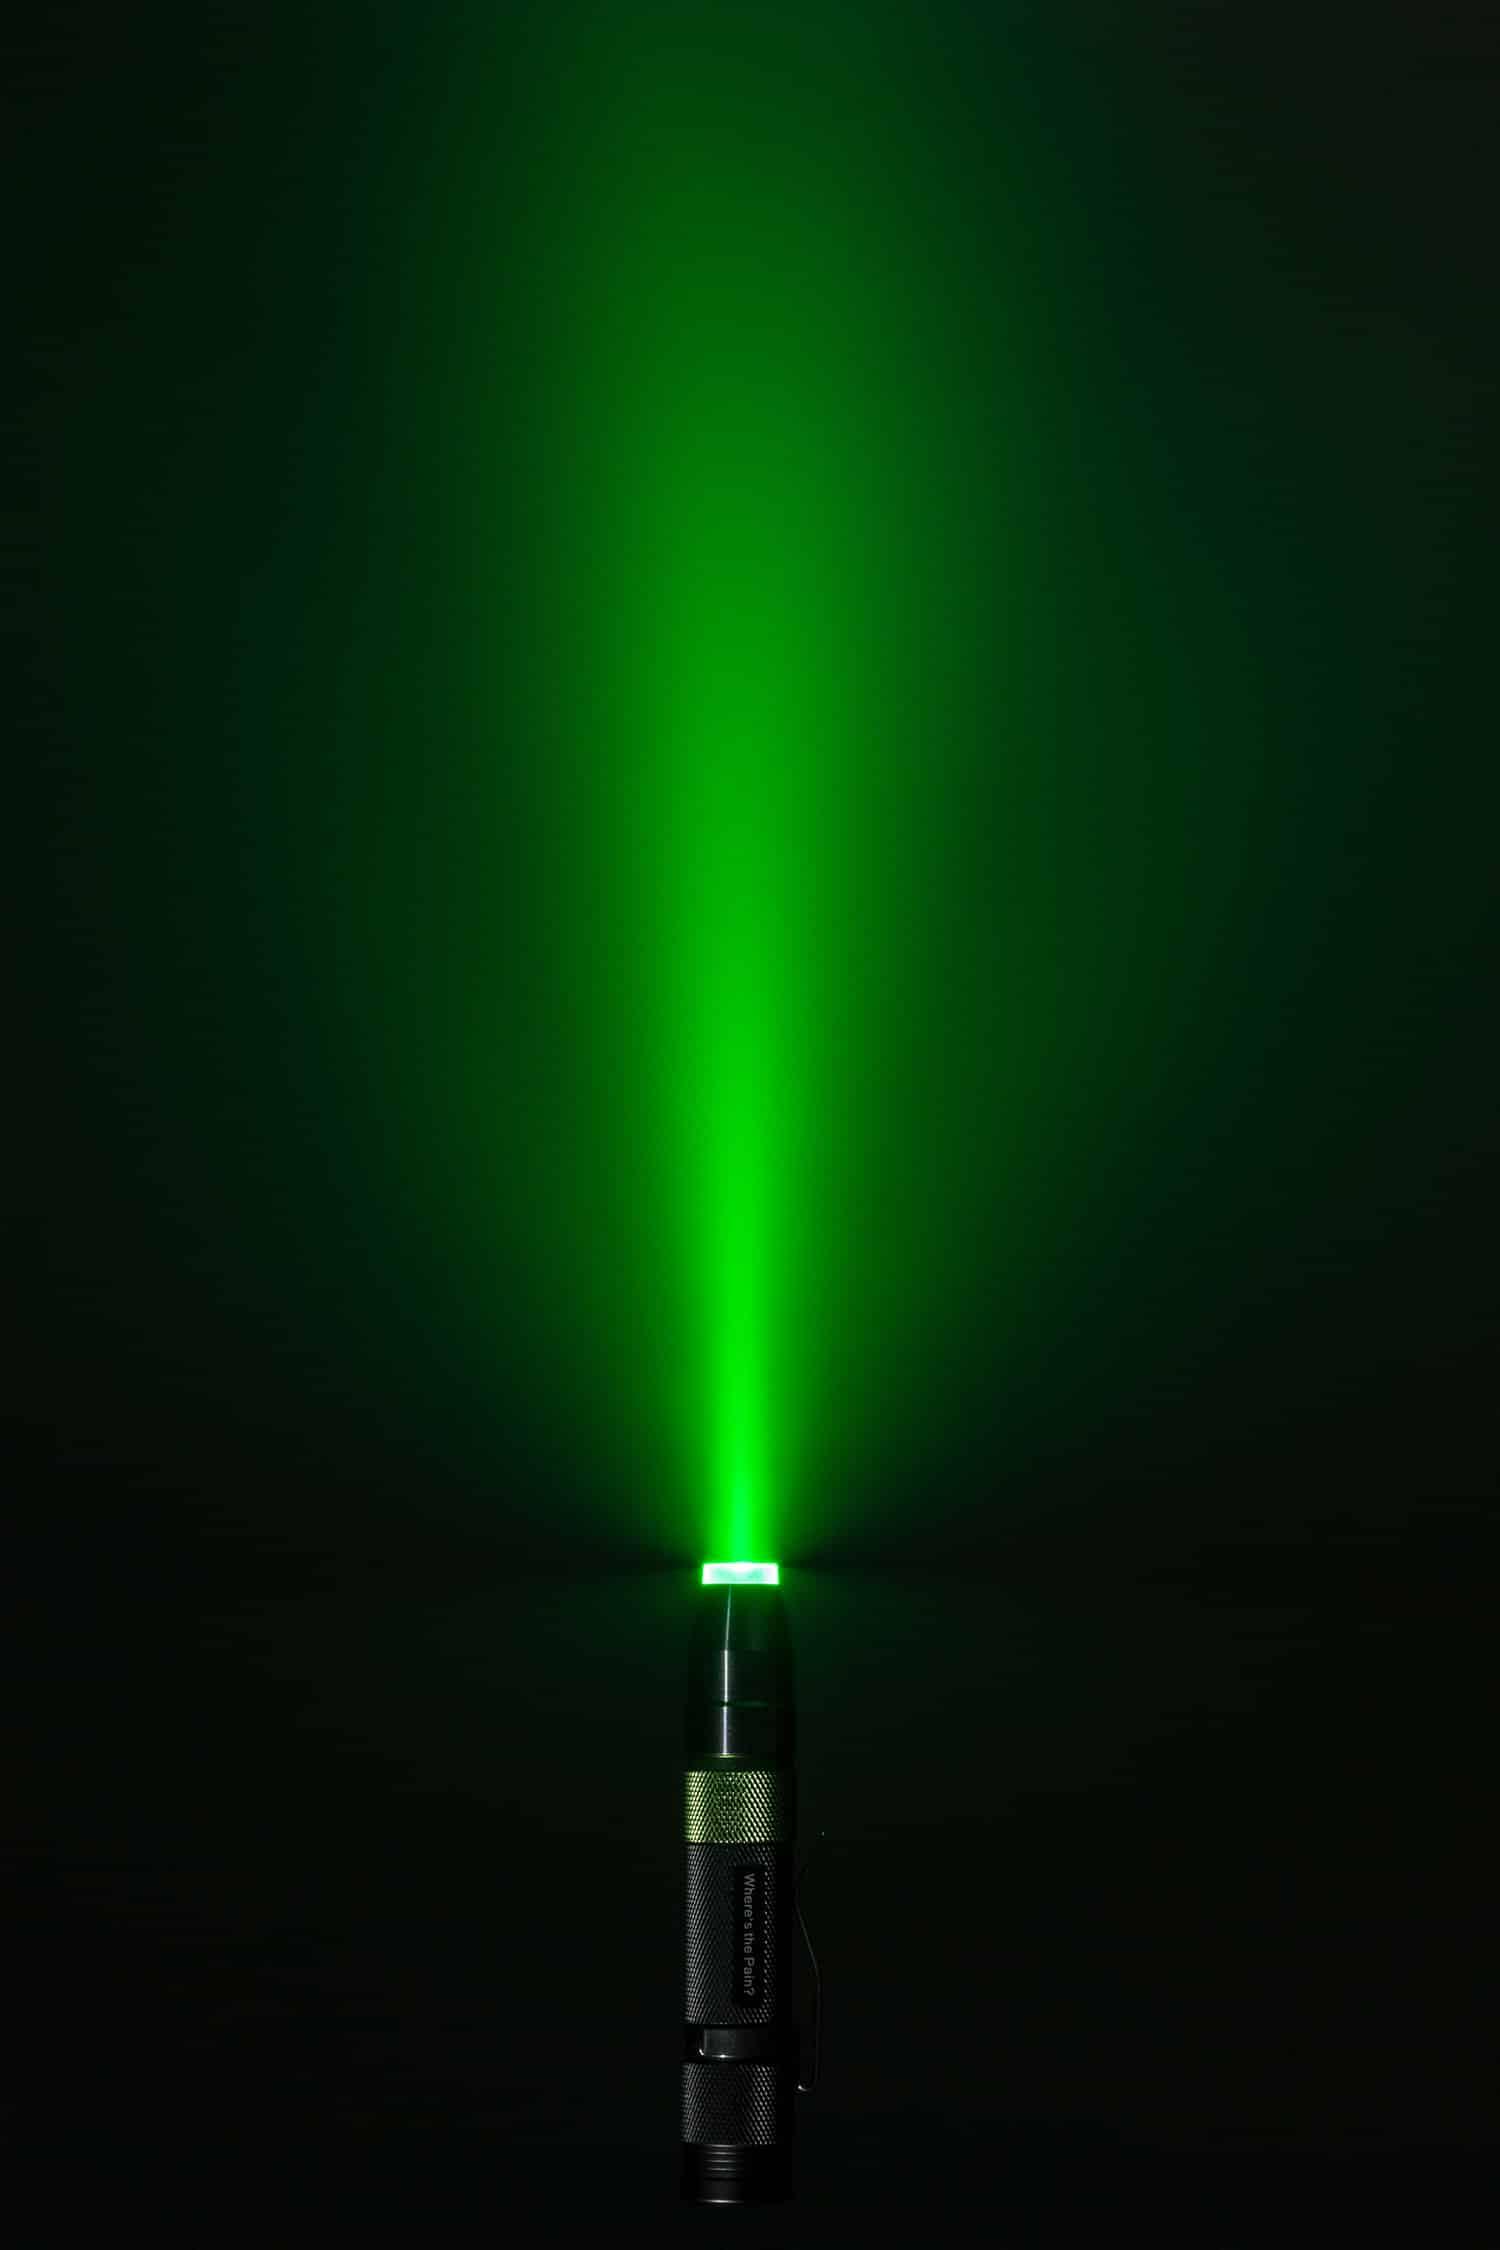 AAH Light, photonic heal, photonic therapy, green light